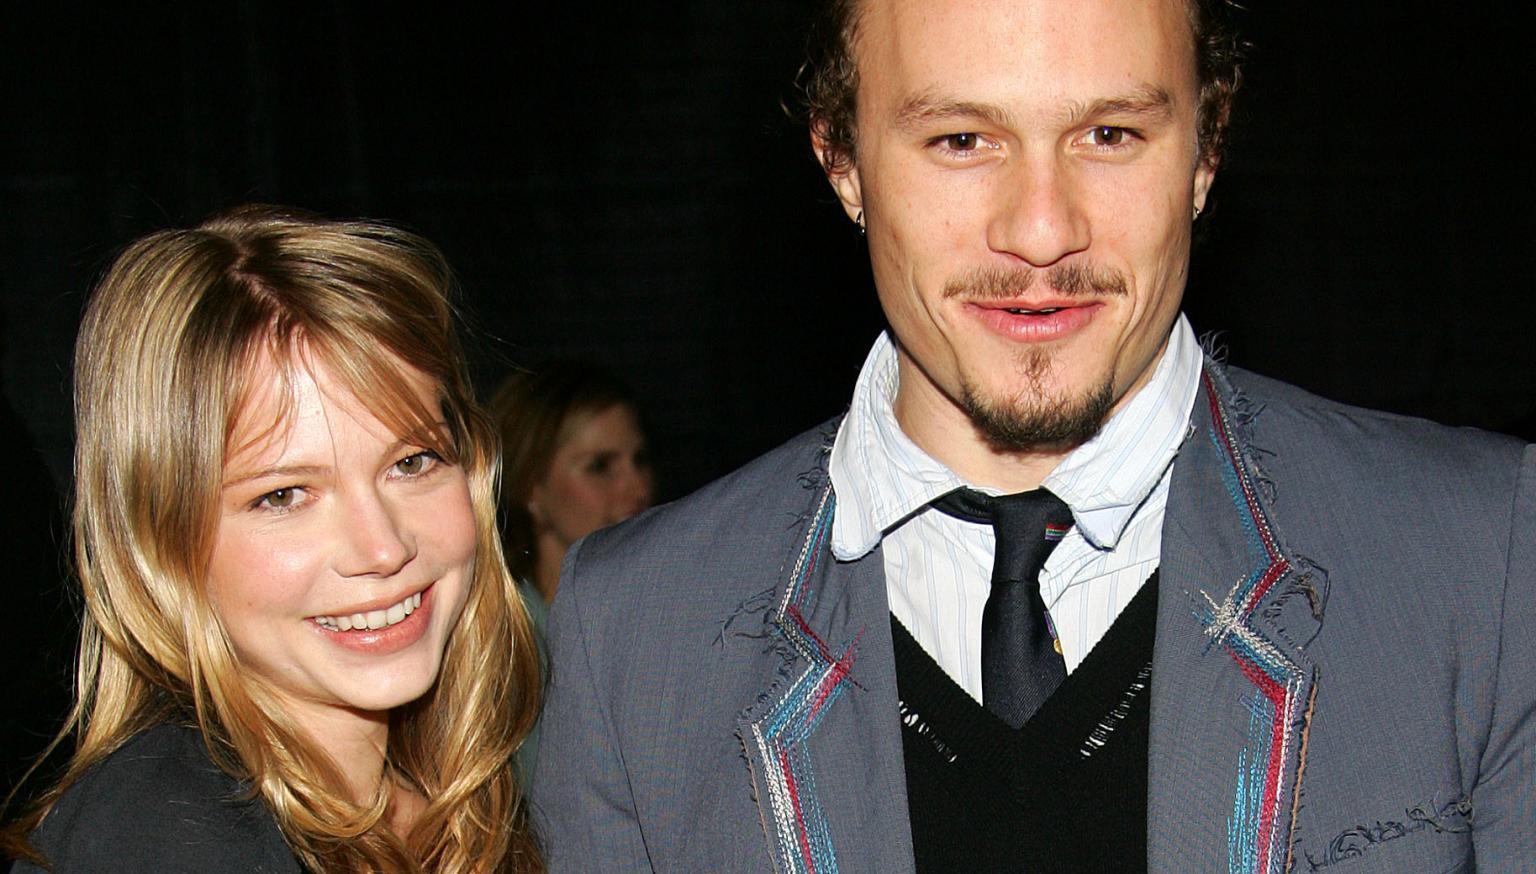 Heath Ledger's daughter Matilda looks so grown up now ...